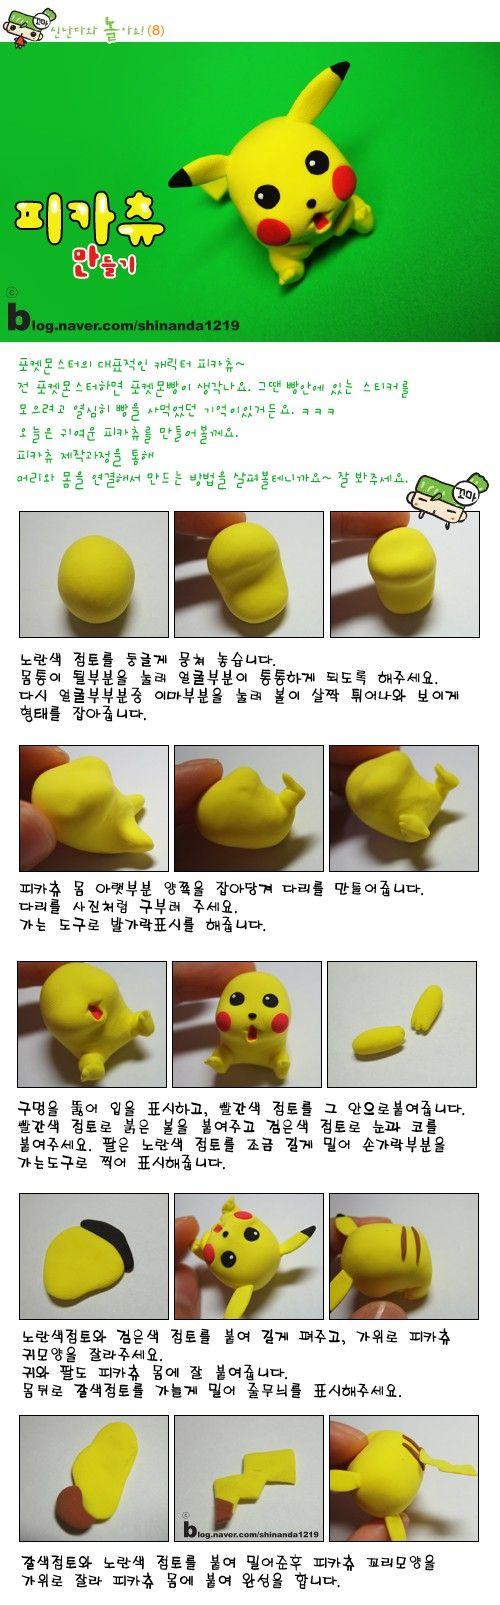 Como hacer a pikachu en porcelana fria